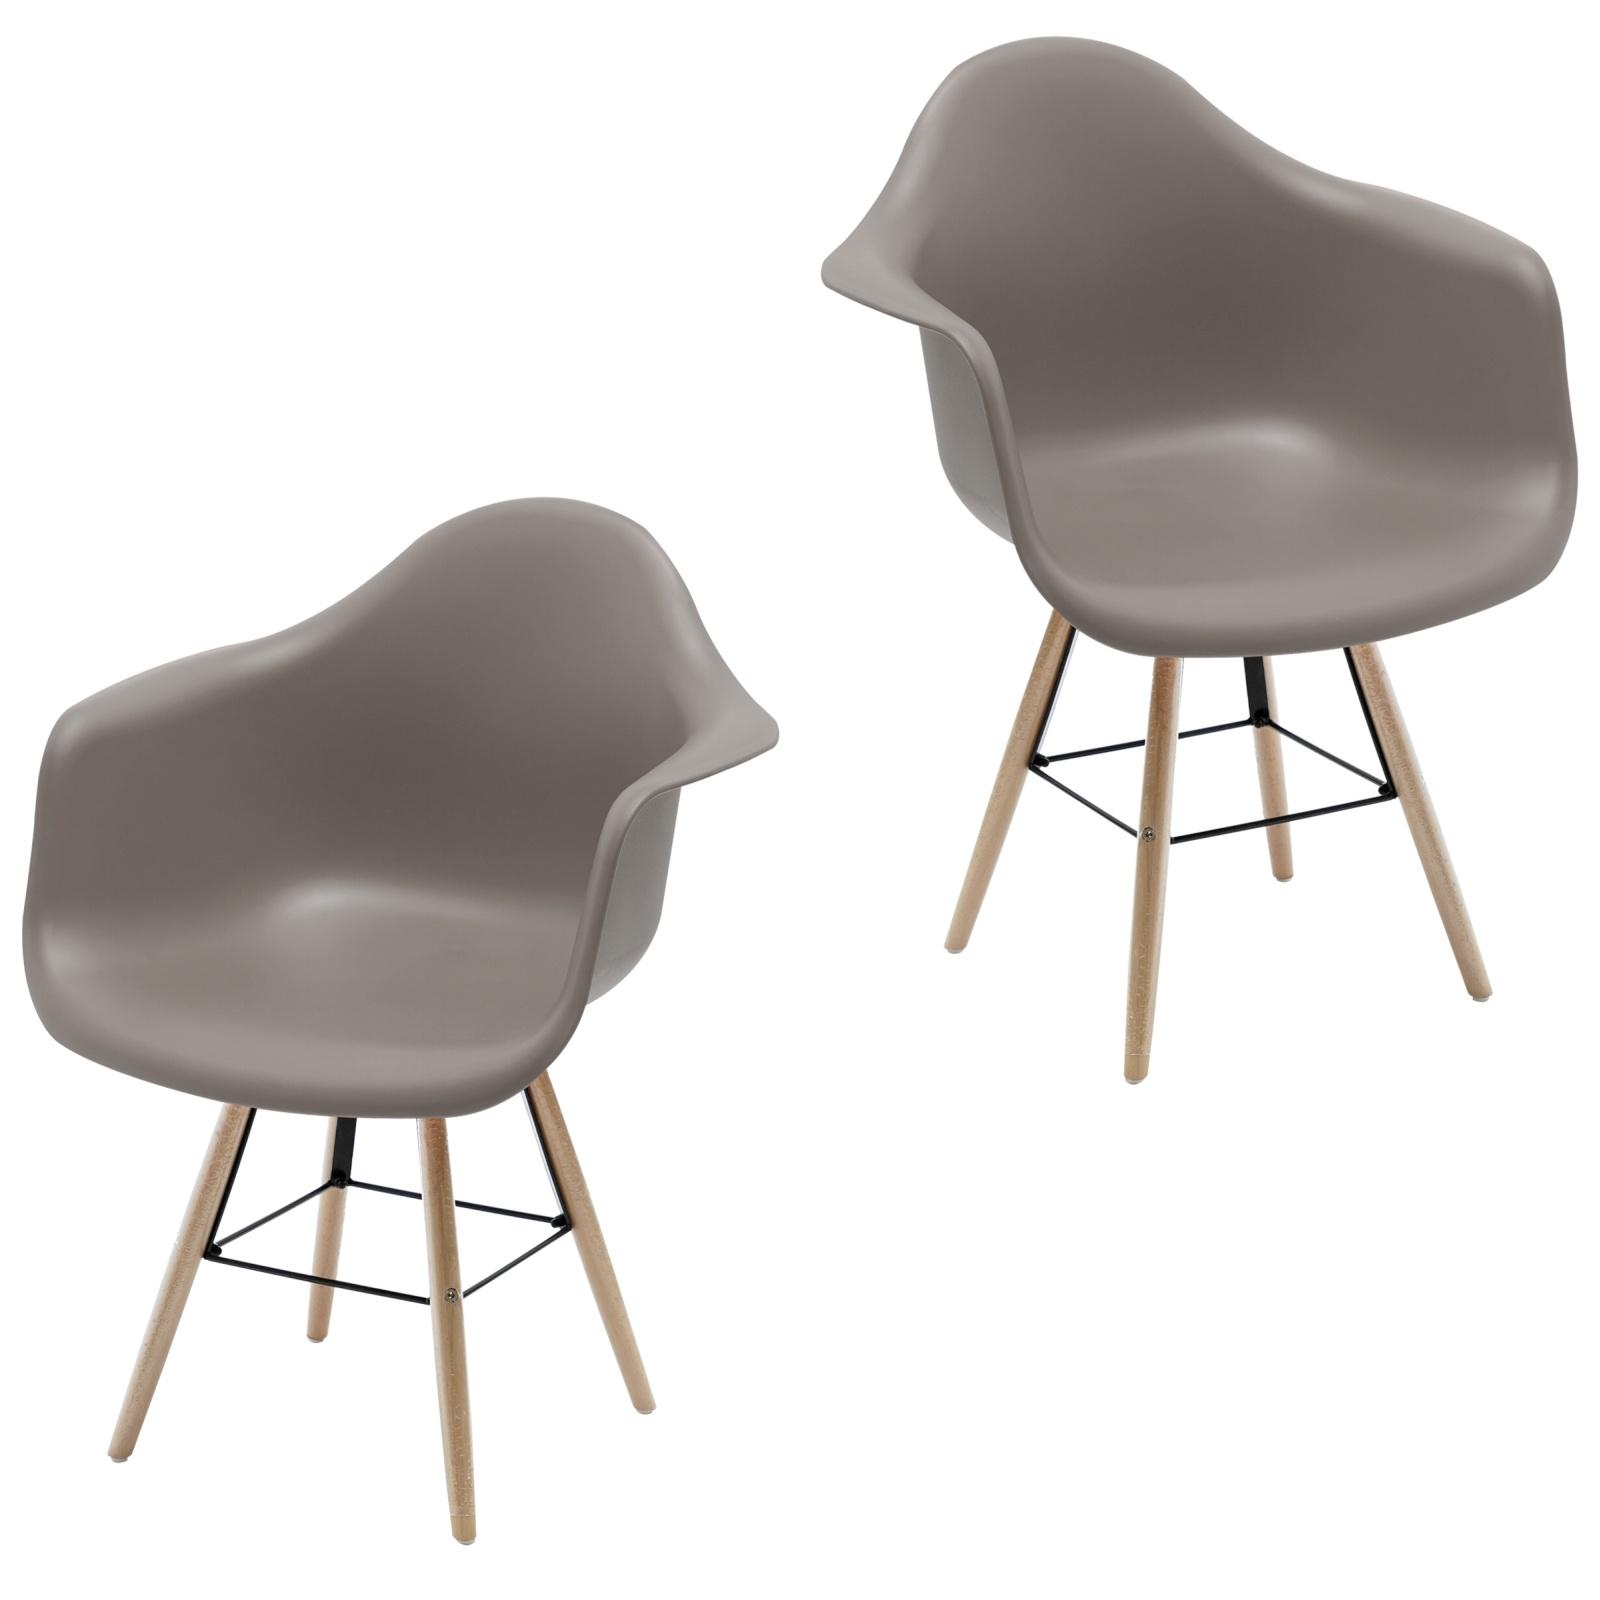 retro sessel regie schalenstuhl pop art deco esszimmer. Black Bedroom Furniture Sets. Home Design Ideas